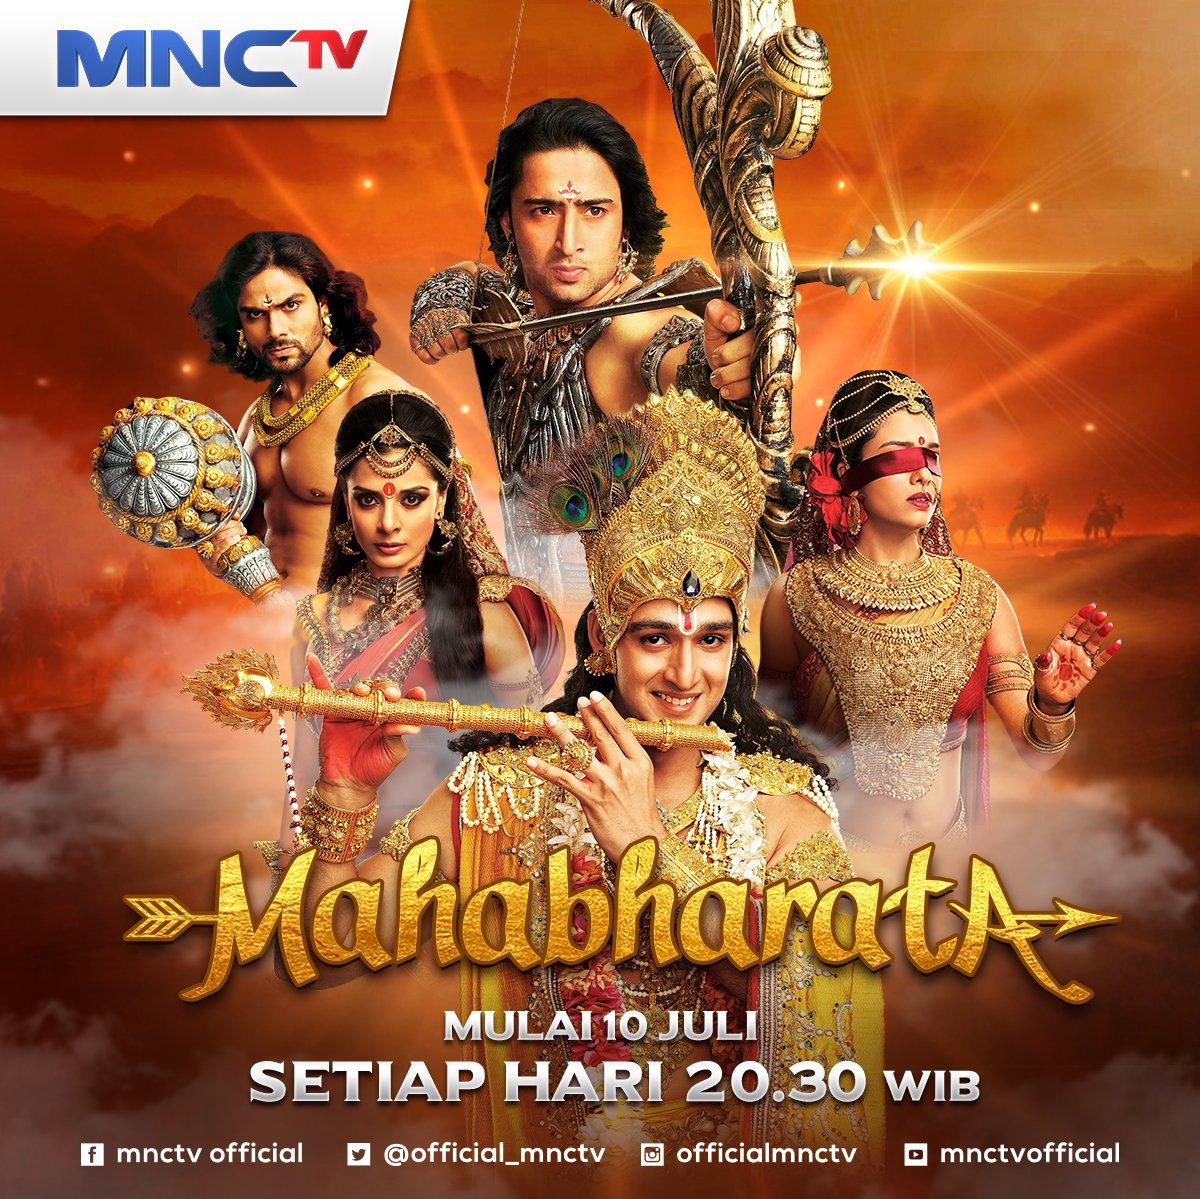 Mahabharata (@Mahabharata_ID) | Twitter